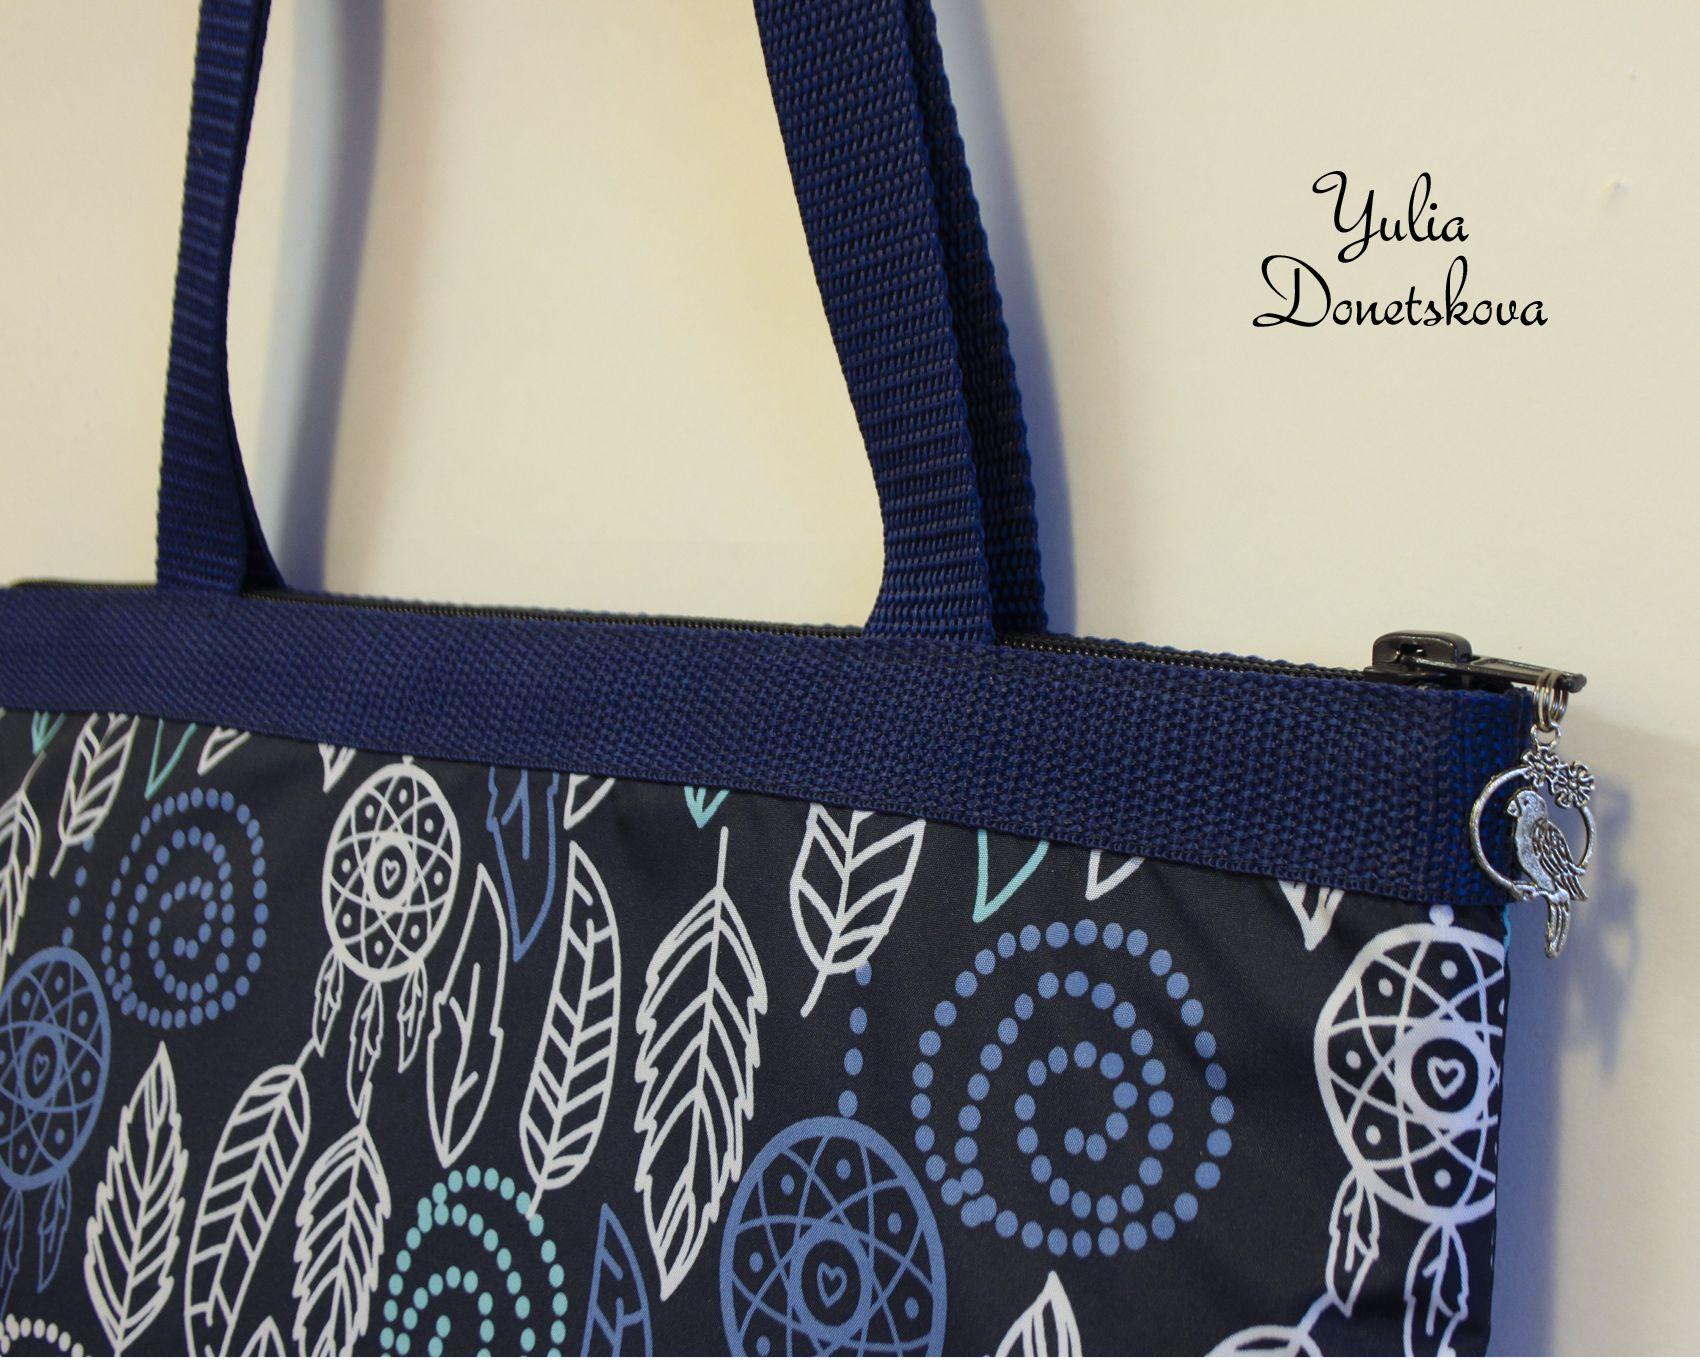 листва путешествие подарок сумка handmade фурнитура стропа удобно